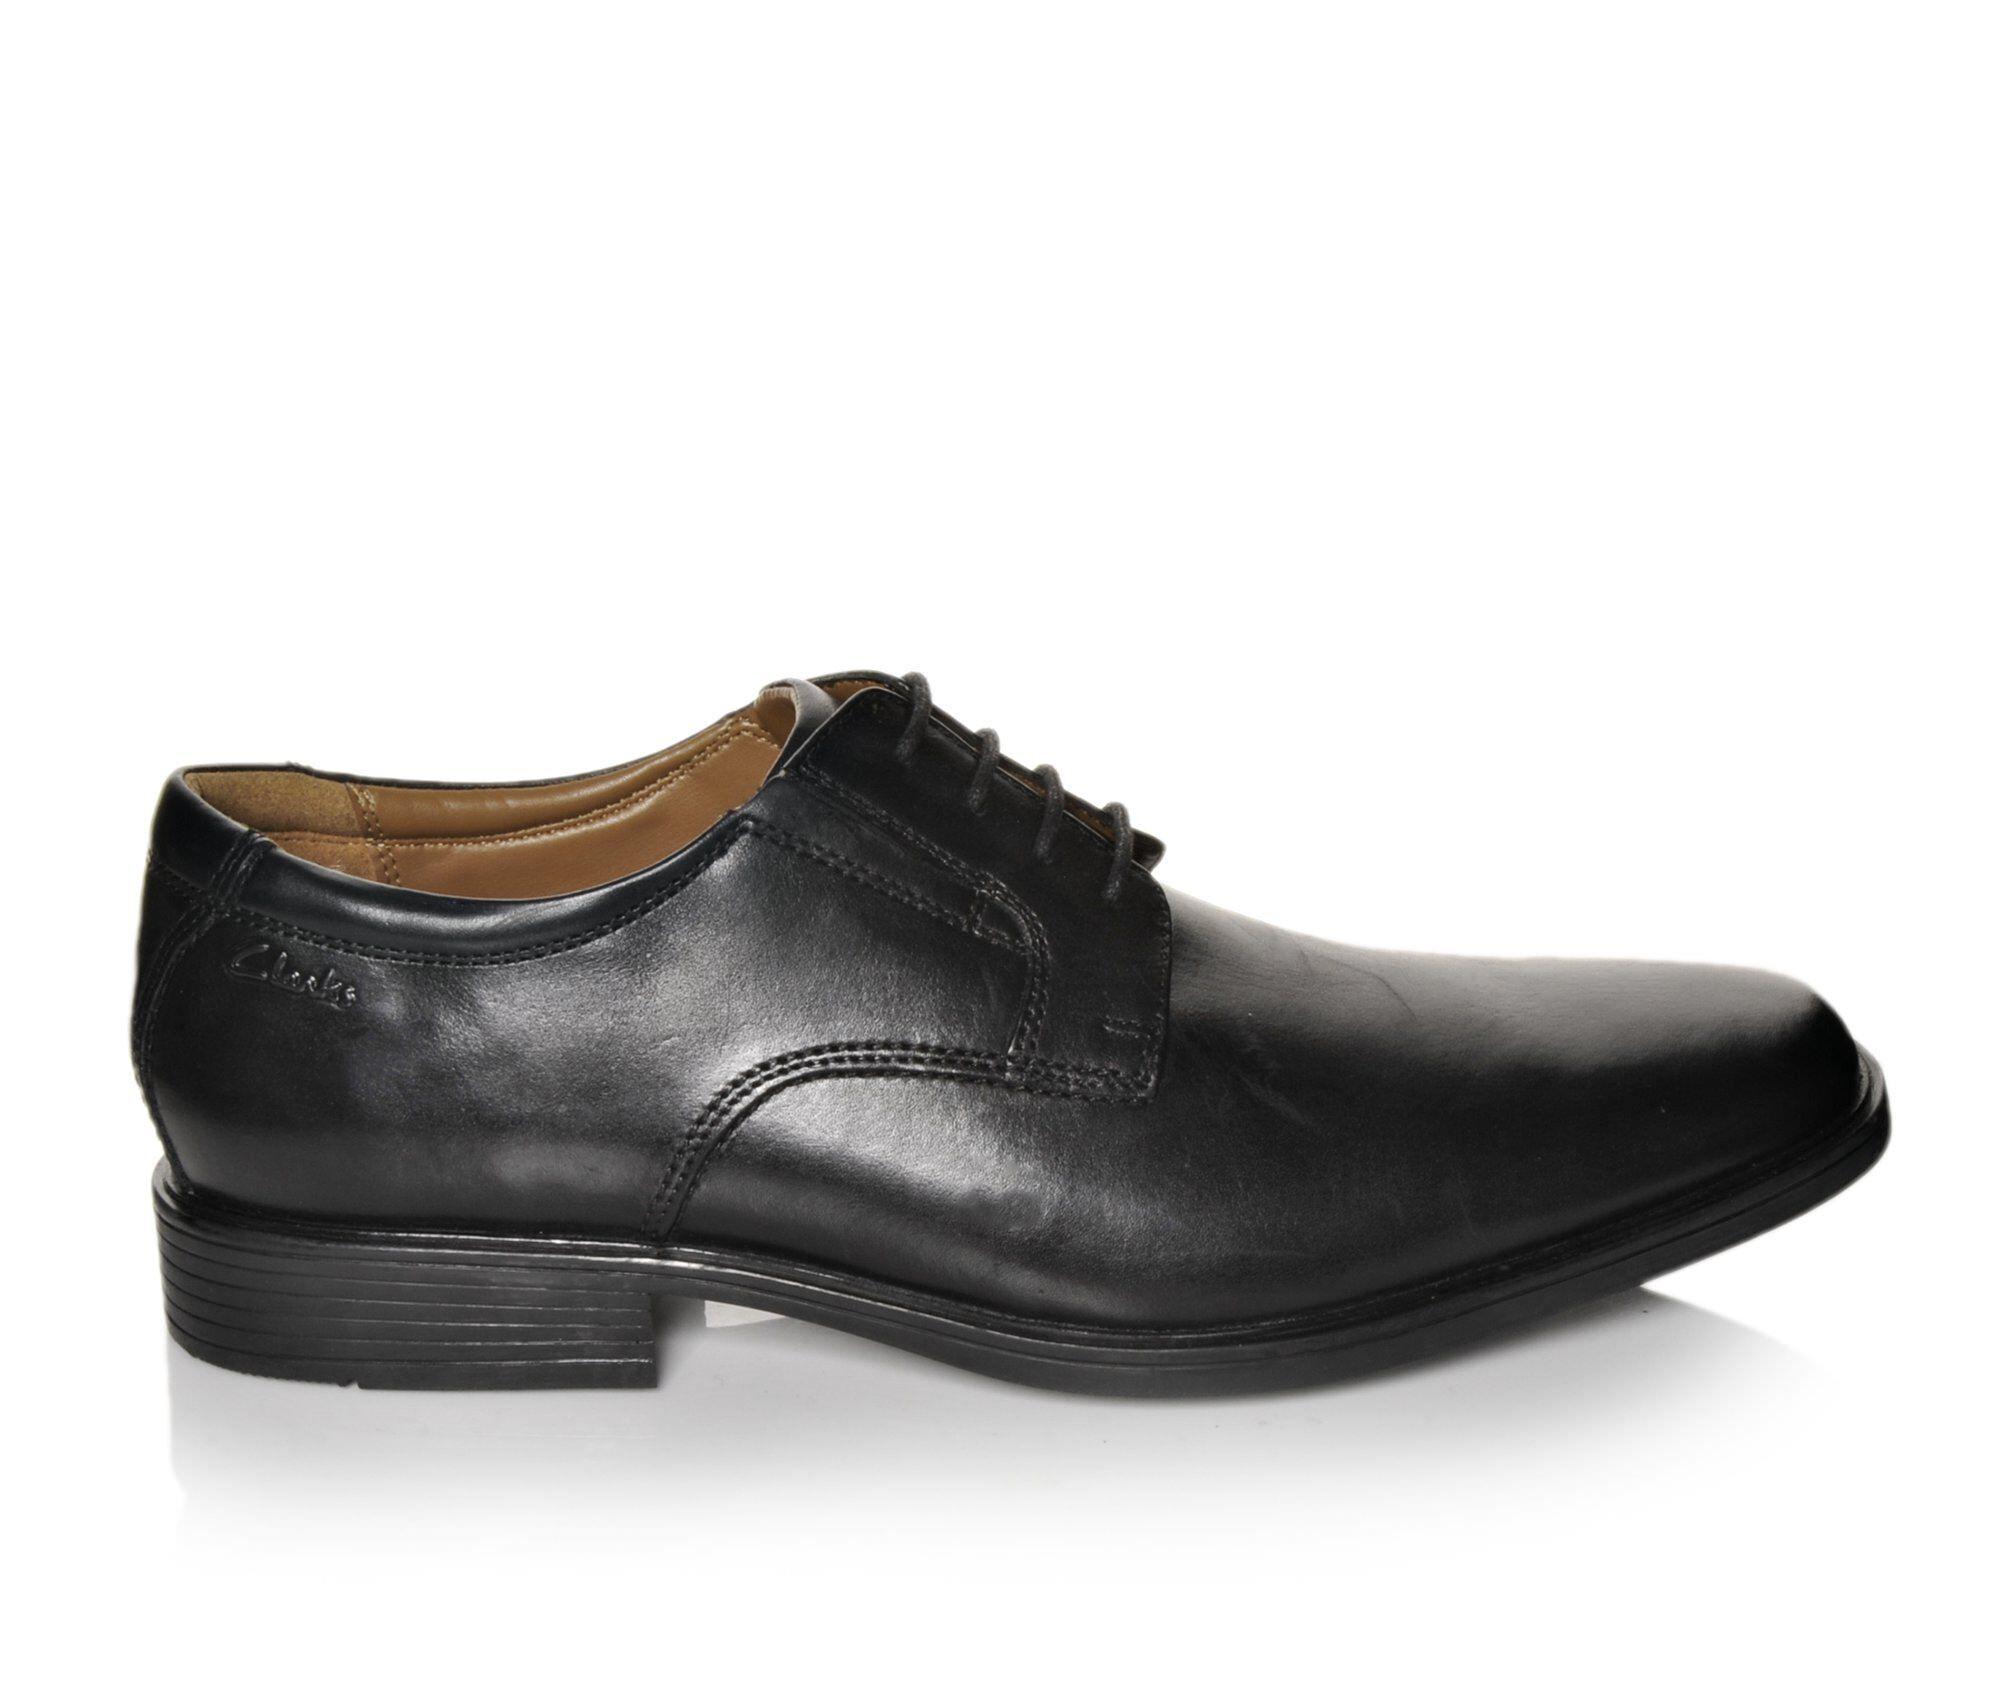 Men's Clarks Tilden Walk Dress Shoes Black